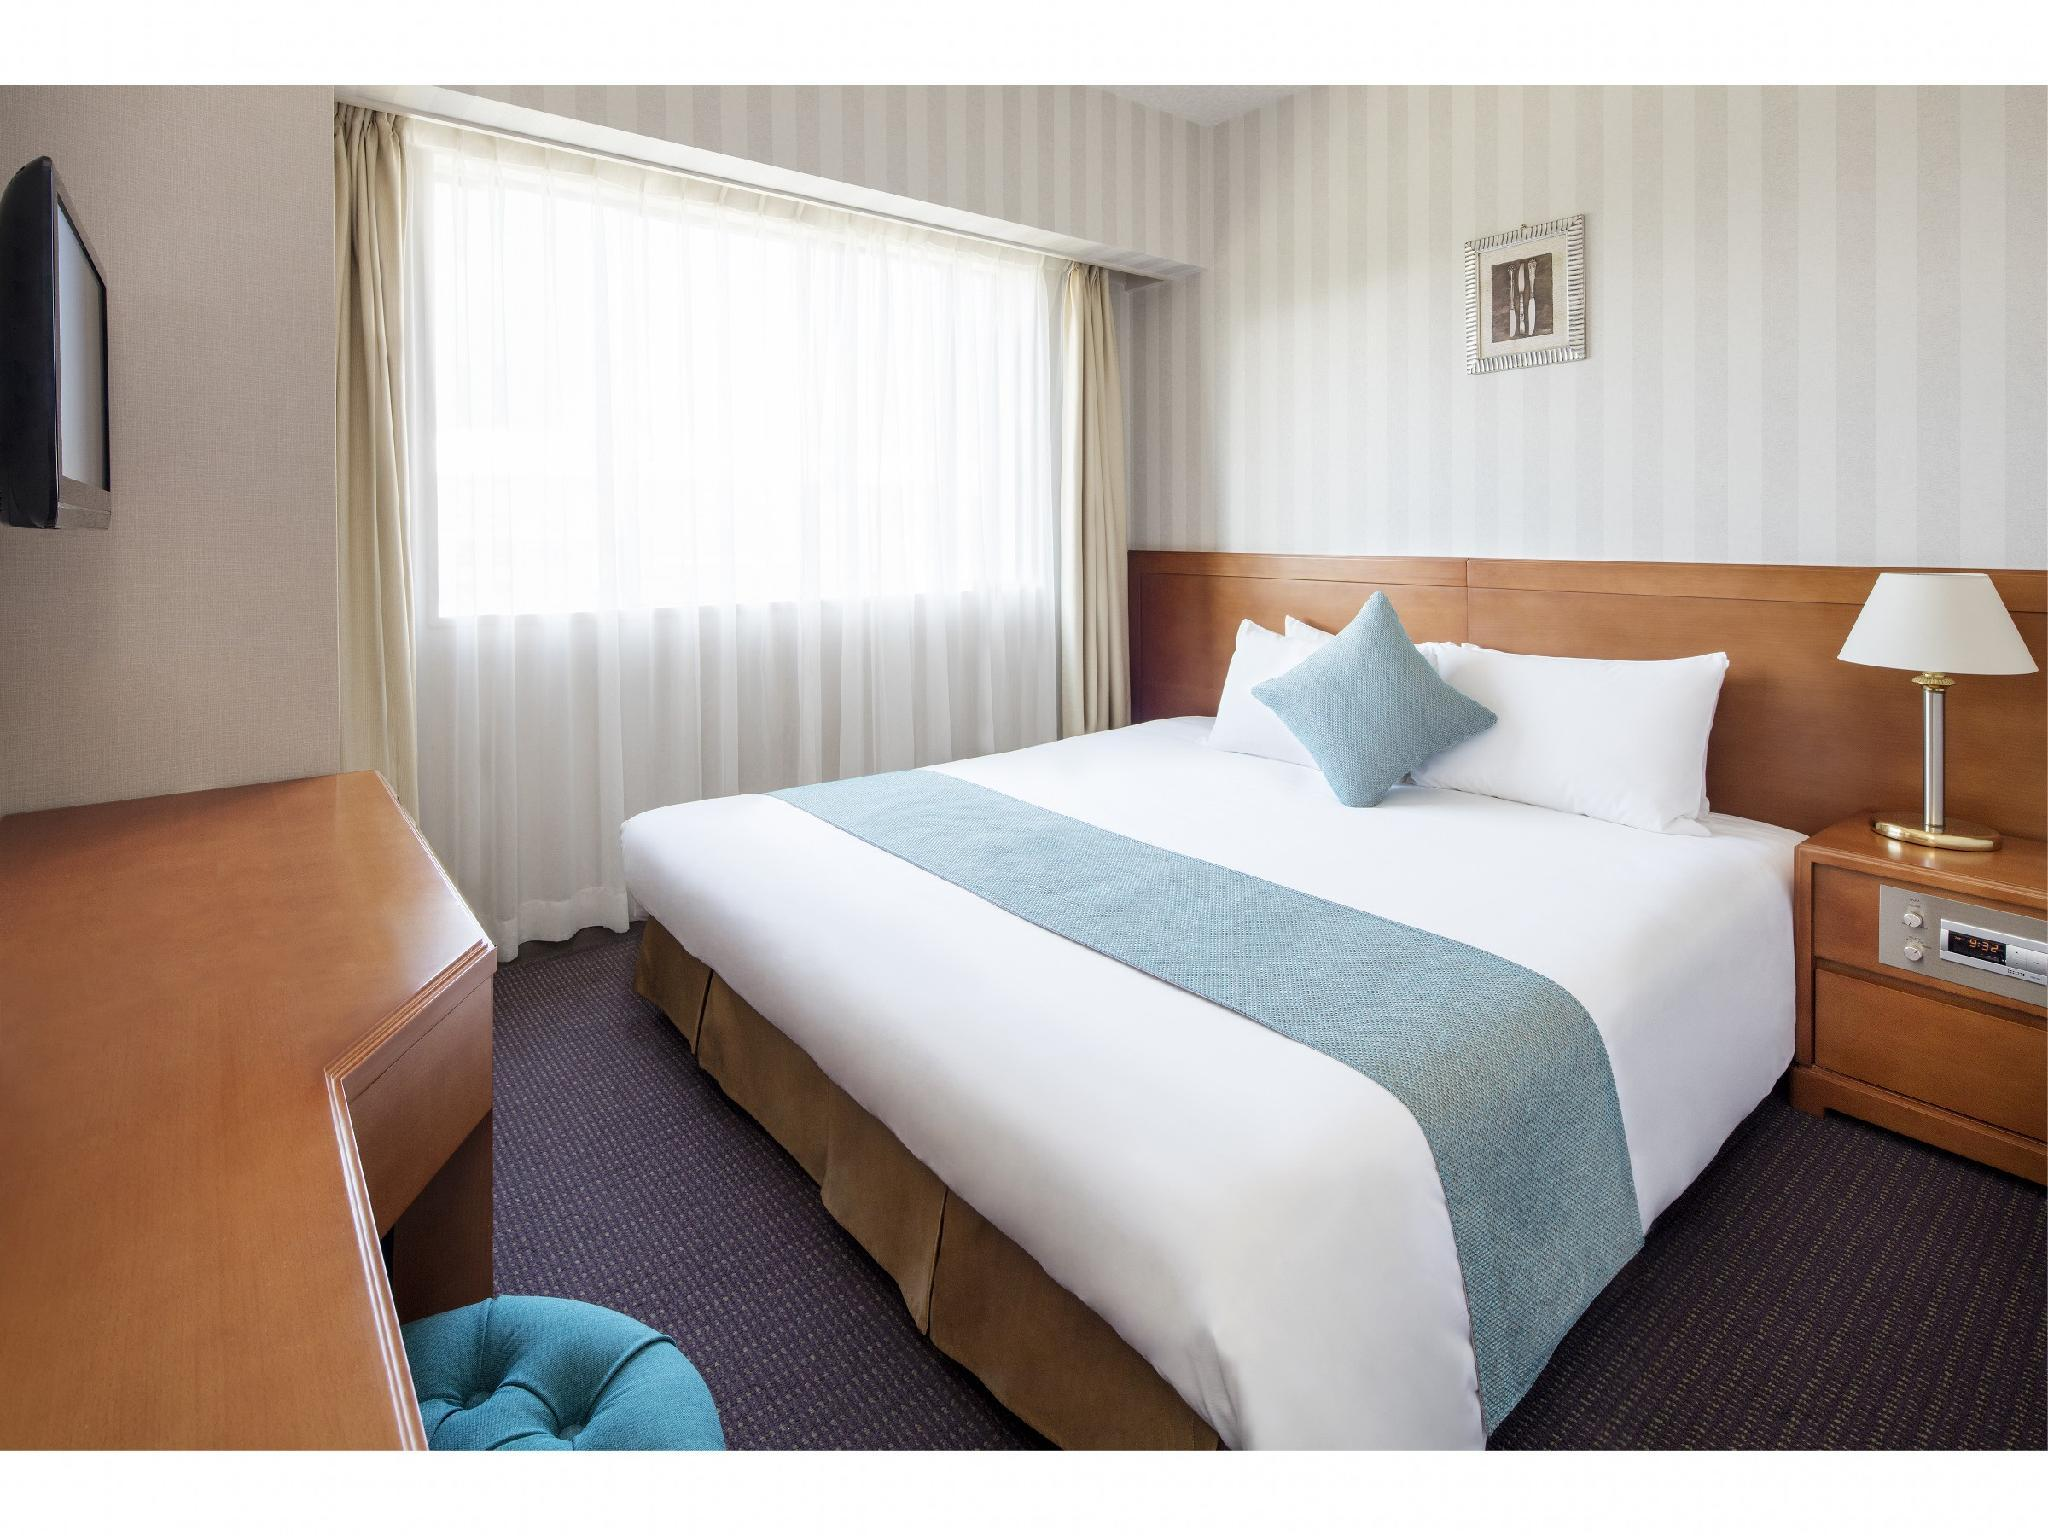 Hotel Francs, Chiba